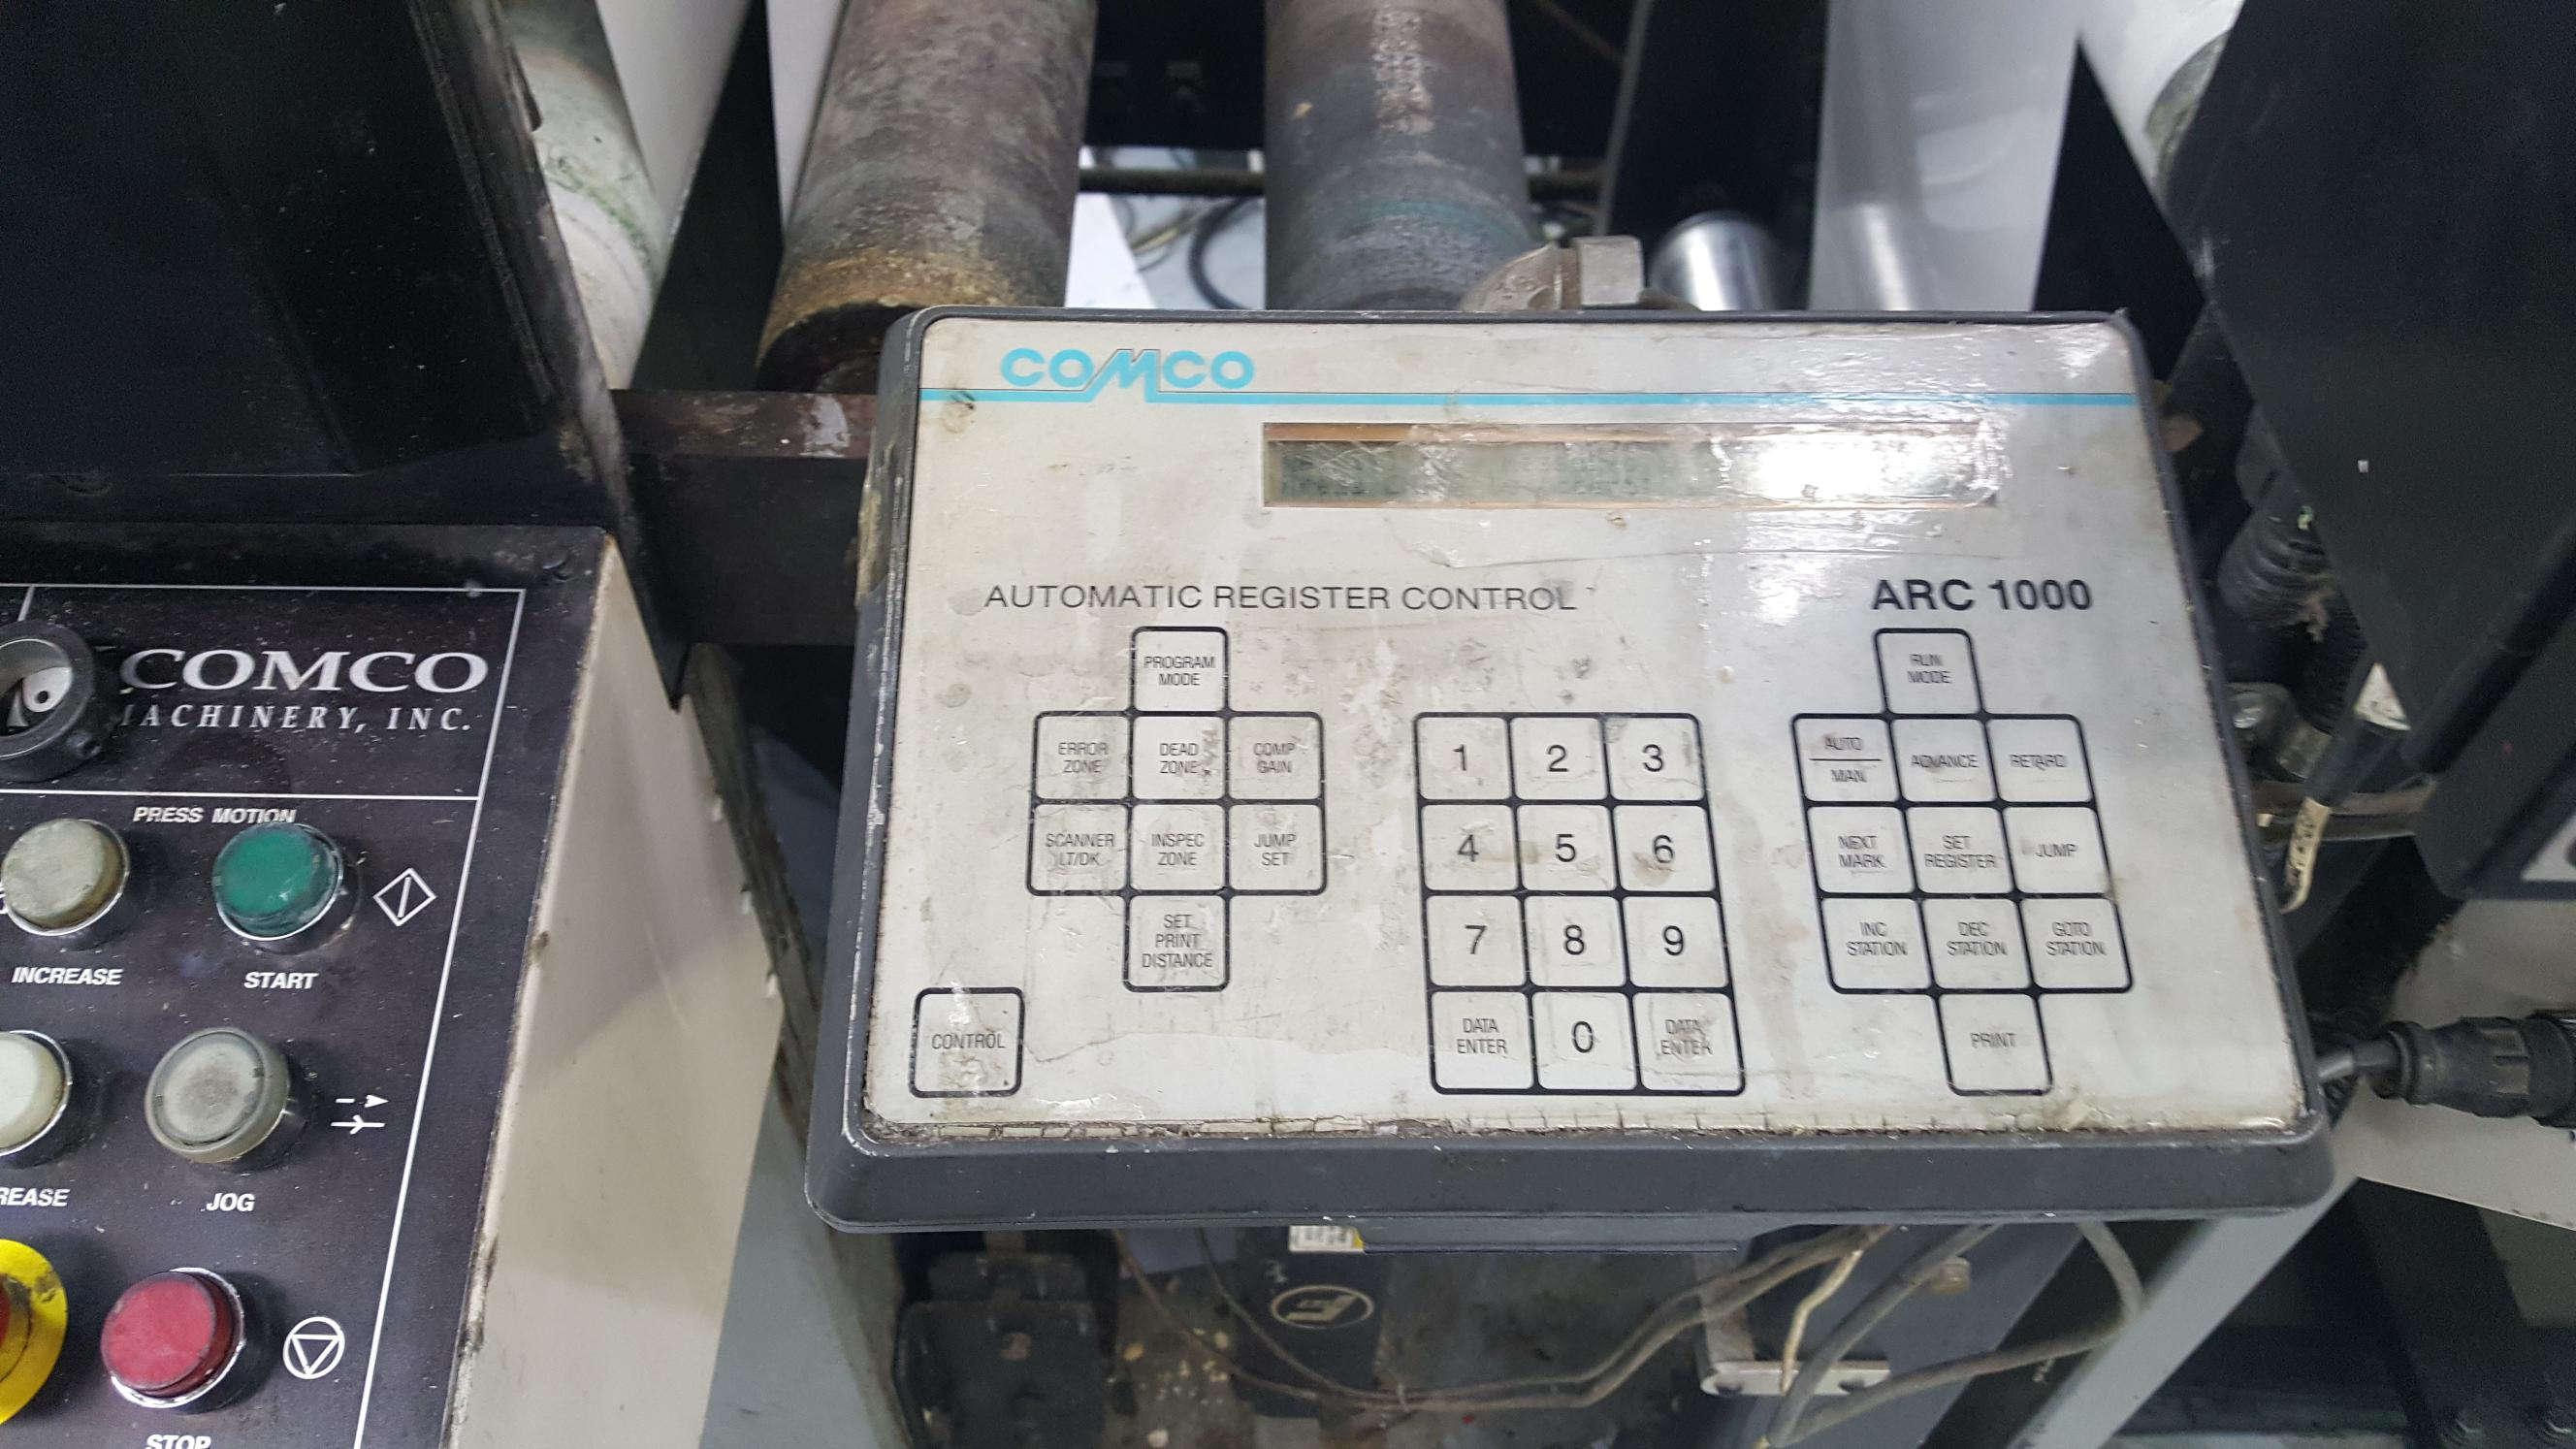 Comco ProGlide - Used Flexo Printing Presses and Used Flexographic Equipment-1